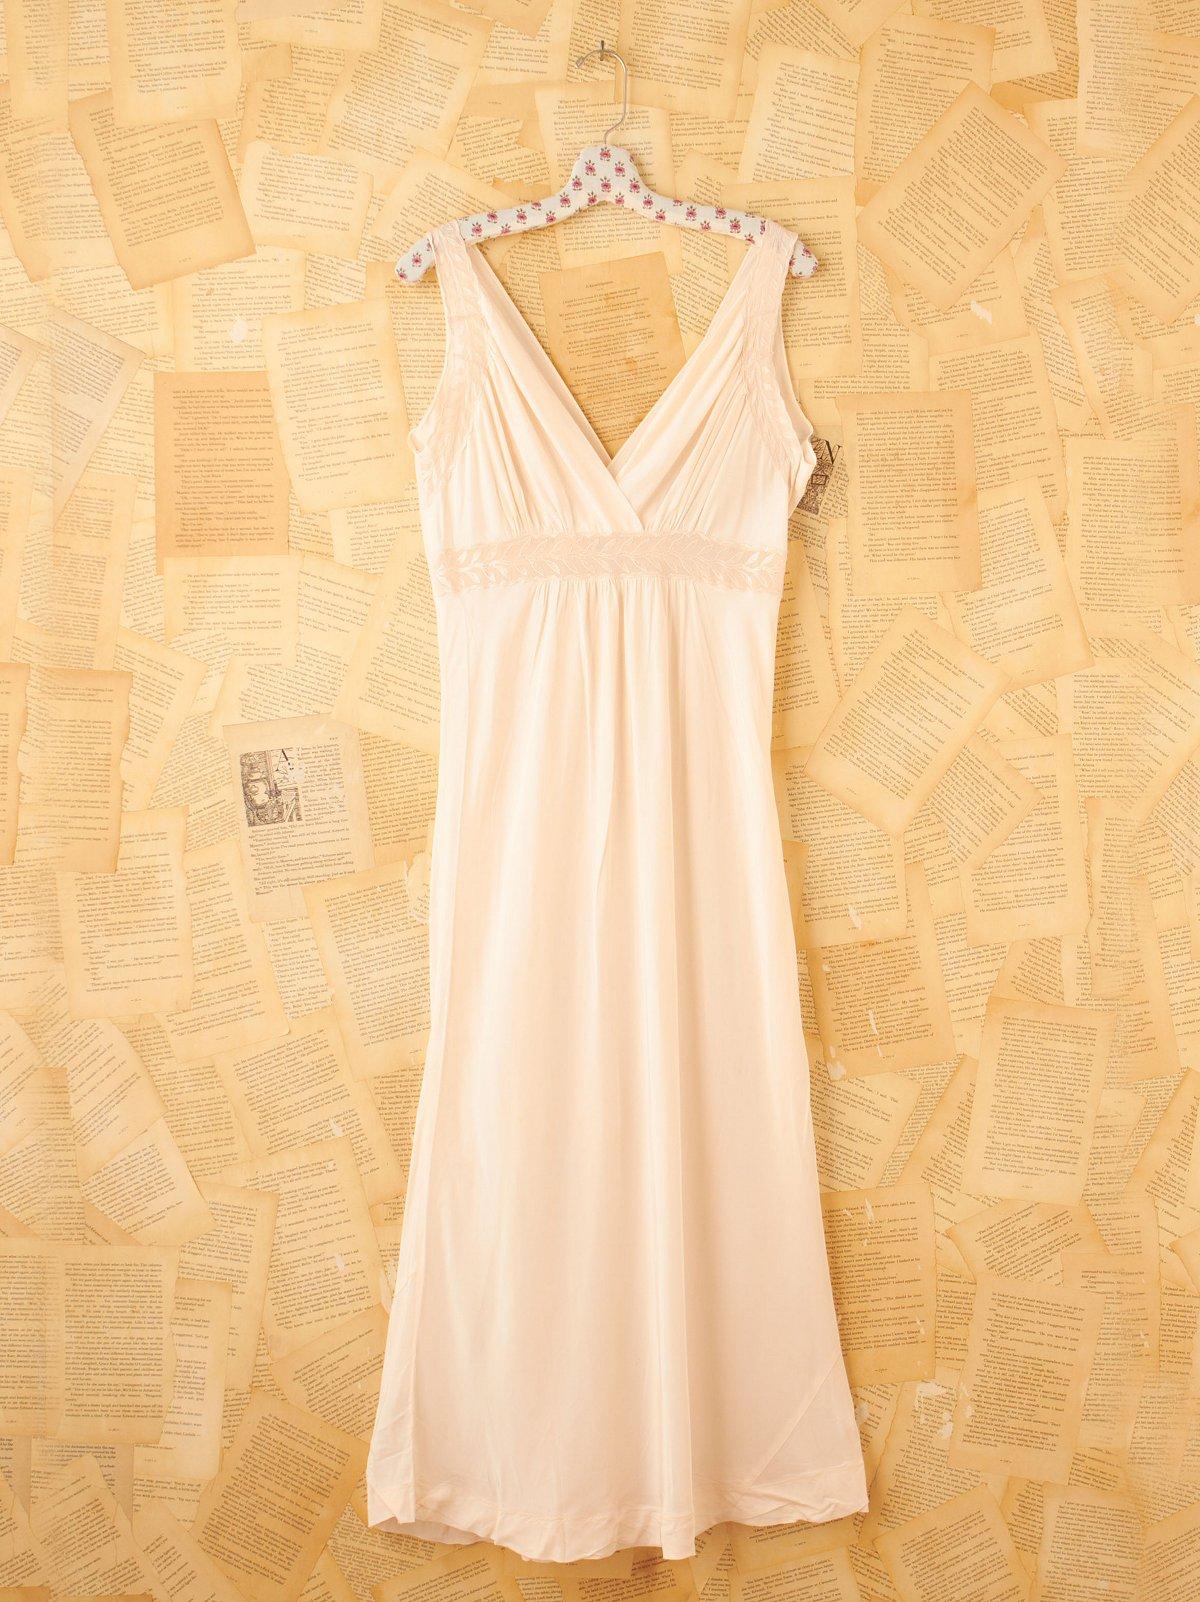 Vintage Lush Slip Dress